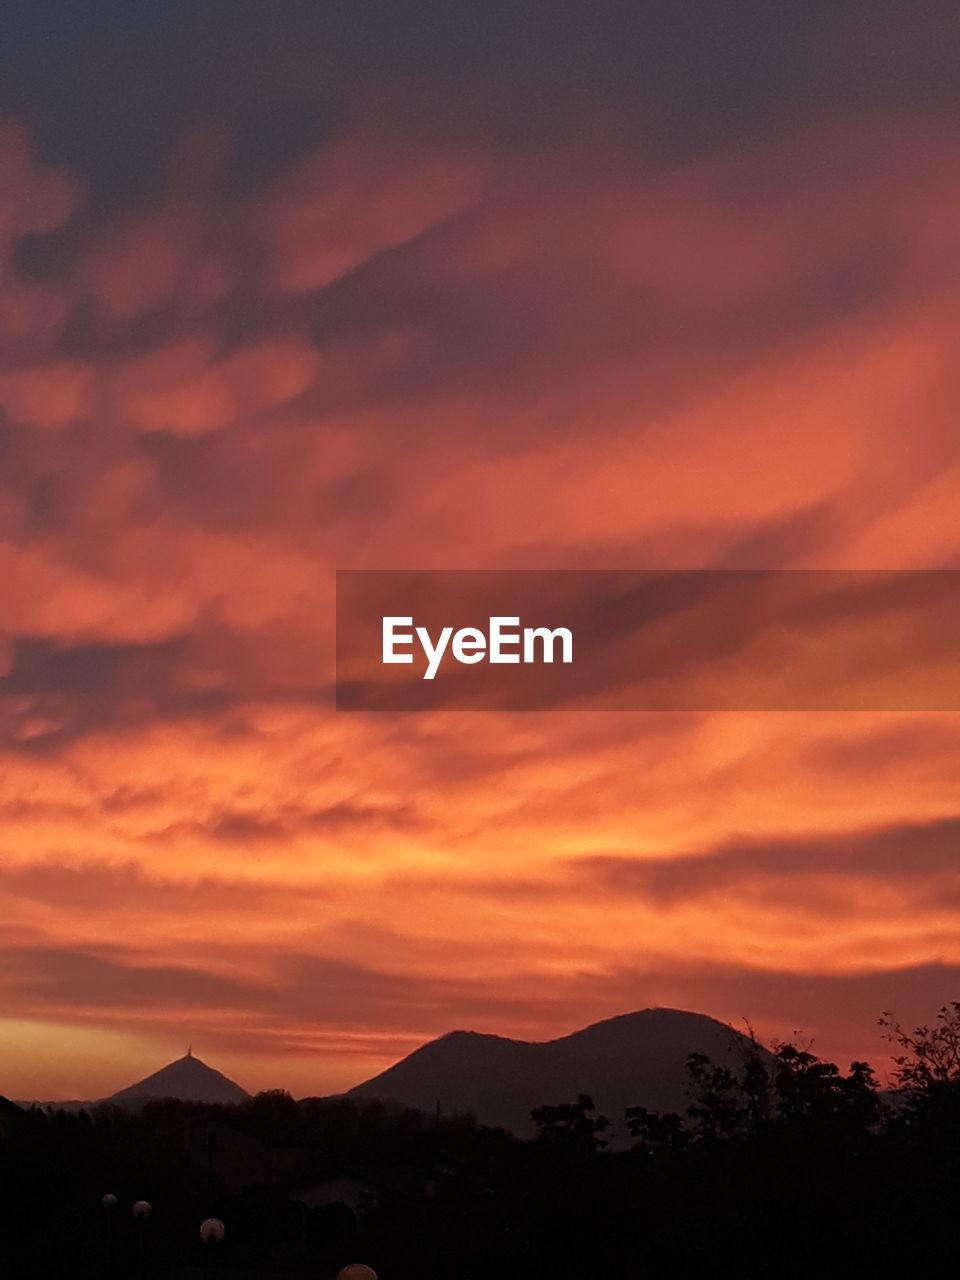 sky, sunset, scenics - nature, beauty in nature, mountain, silhouette, cloud - sky, orange color, tranquil scene, tranquility, idyllic, environment, mountain range, no people, non-urban scene, nature, landscape, dramatic sky, outdoors, remote, mountain peak, romantic sky